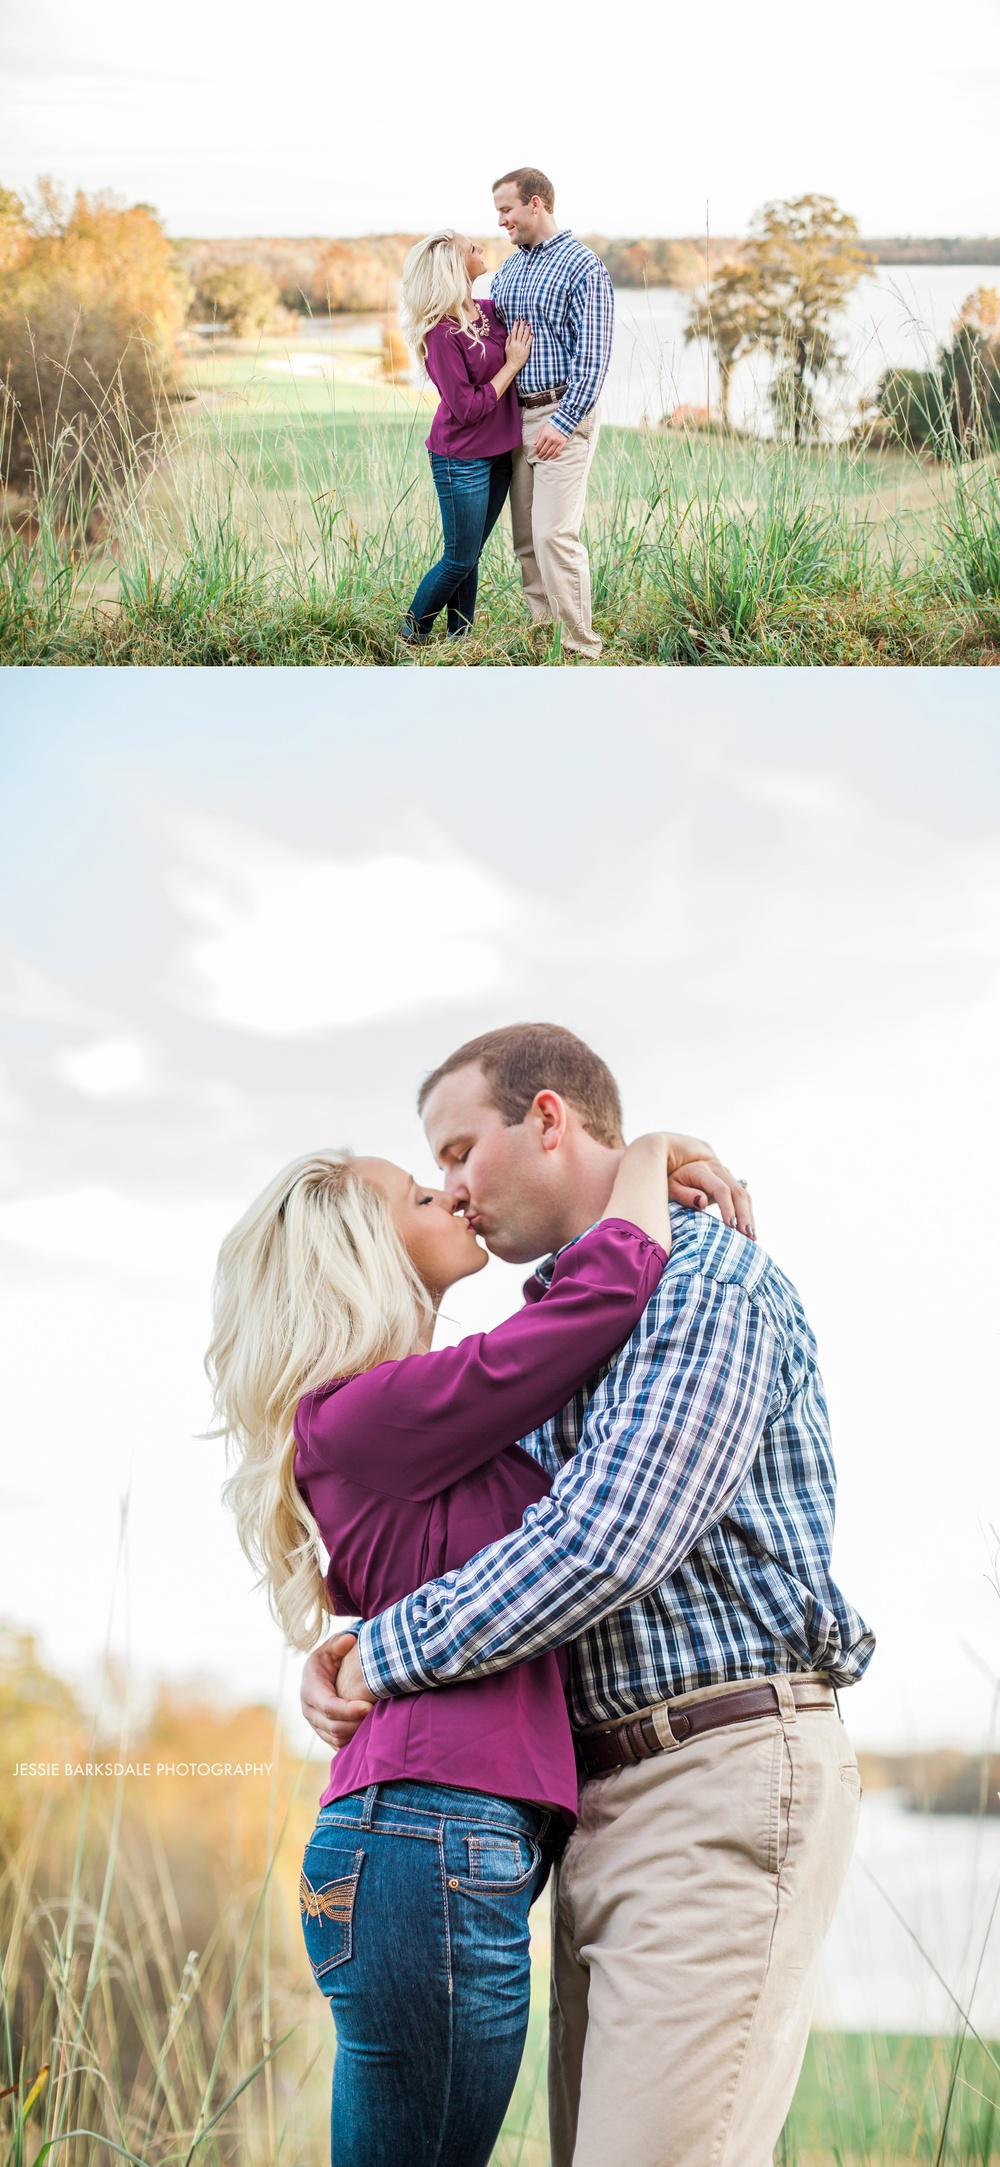 Jessie Barksdale Photography_Alabama Destination Wedding Photographer_Robert Trent Jones Capitol Hill_Engagement_0008